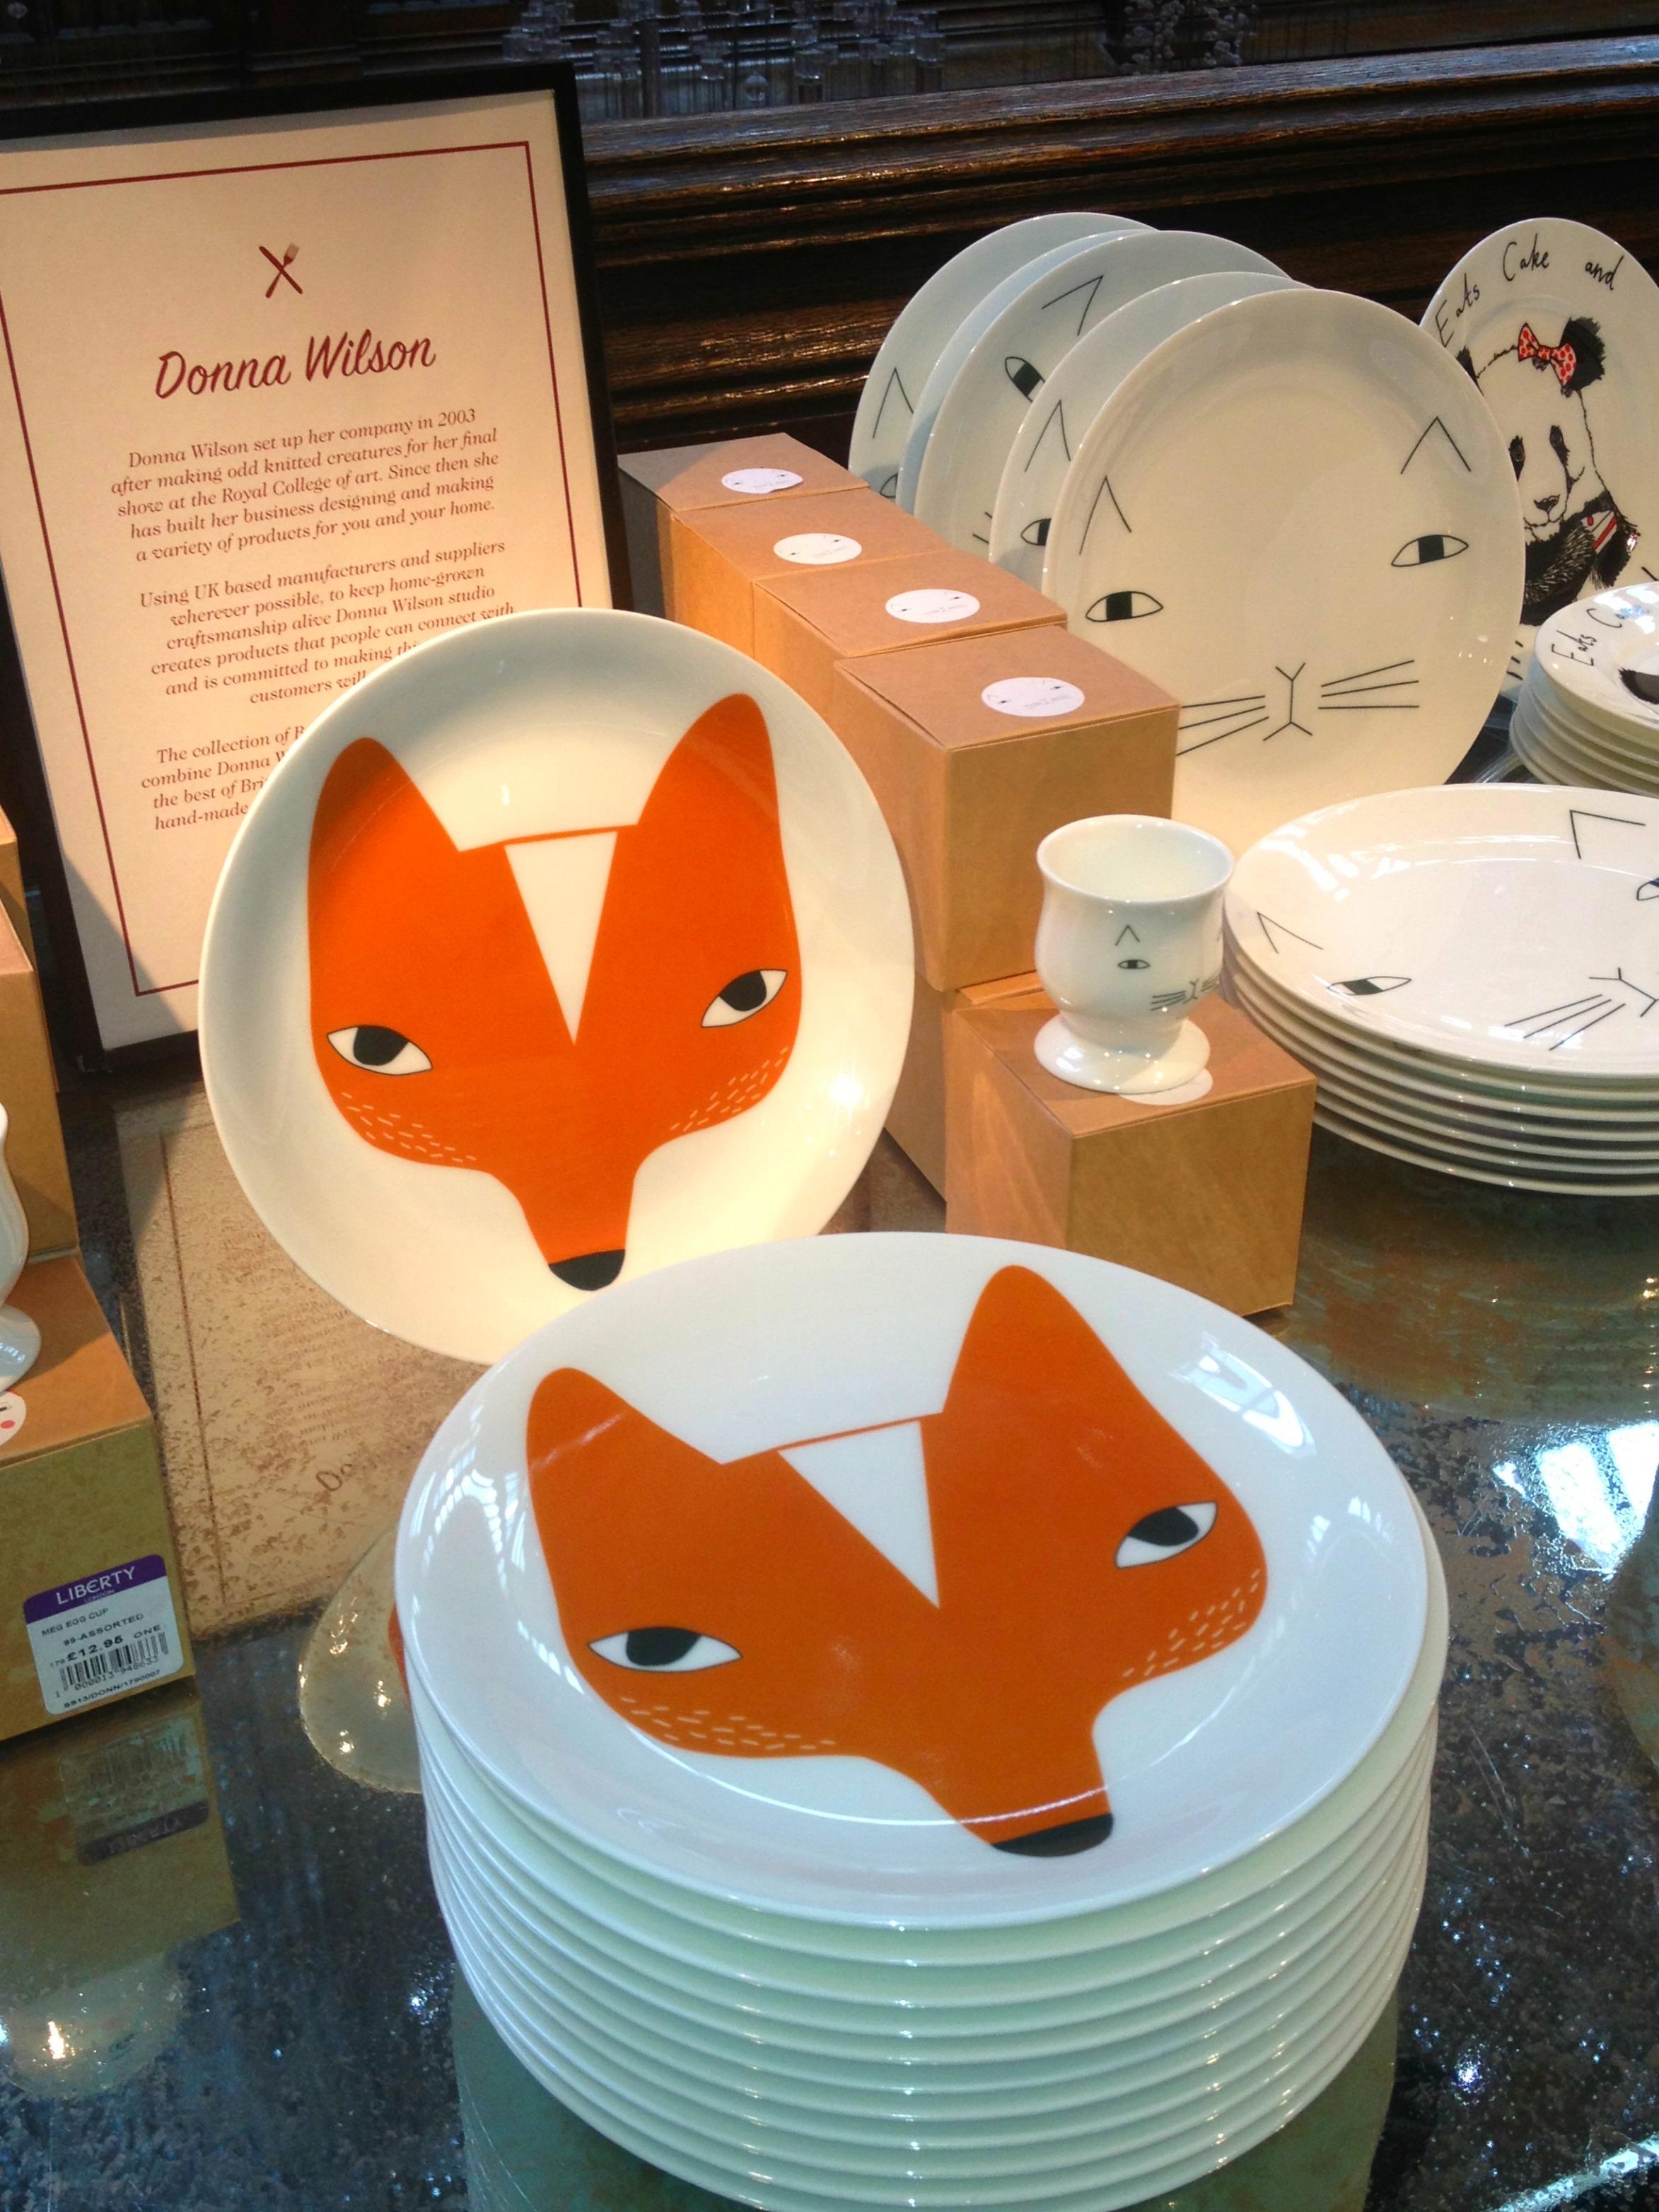 donna wilson plates